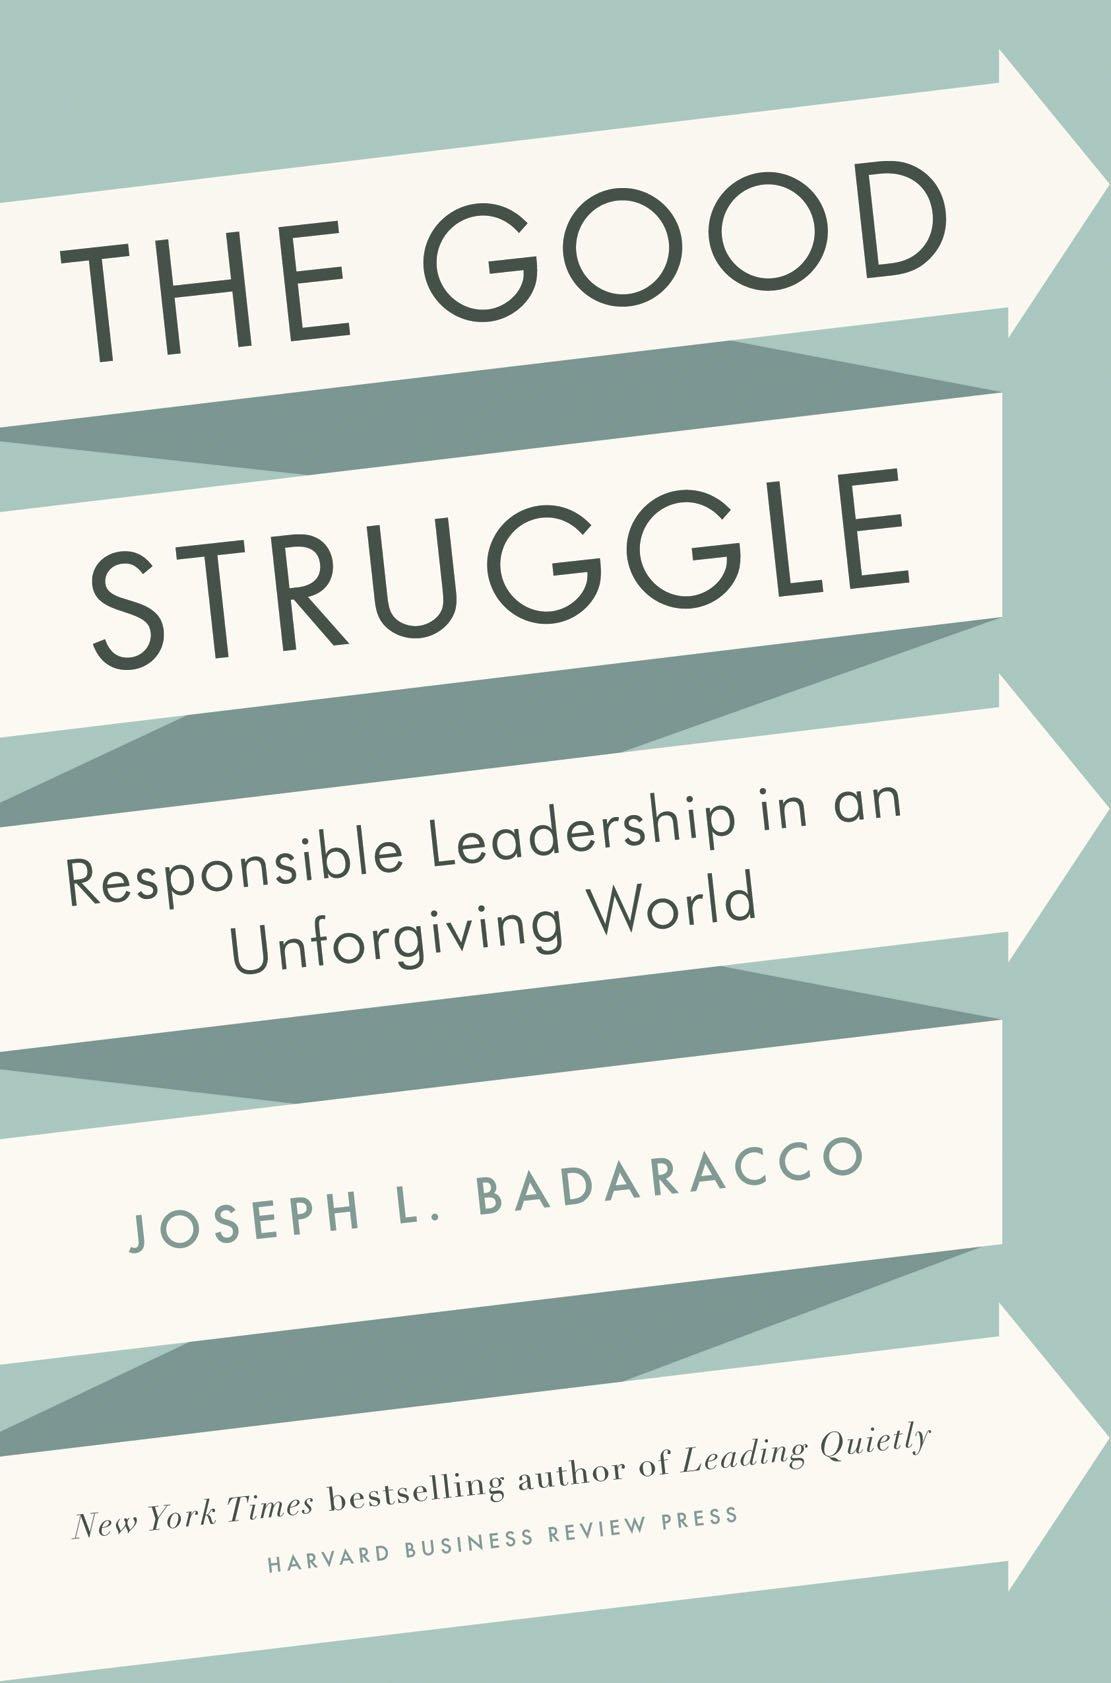 The Good Struggle: Responsible Leadership in an Unforgiving World ebook